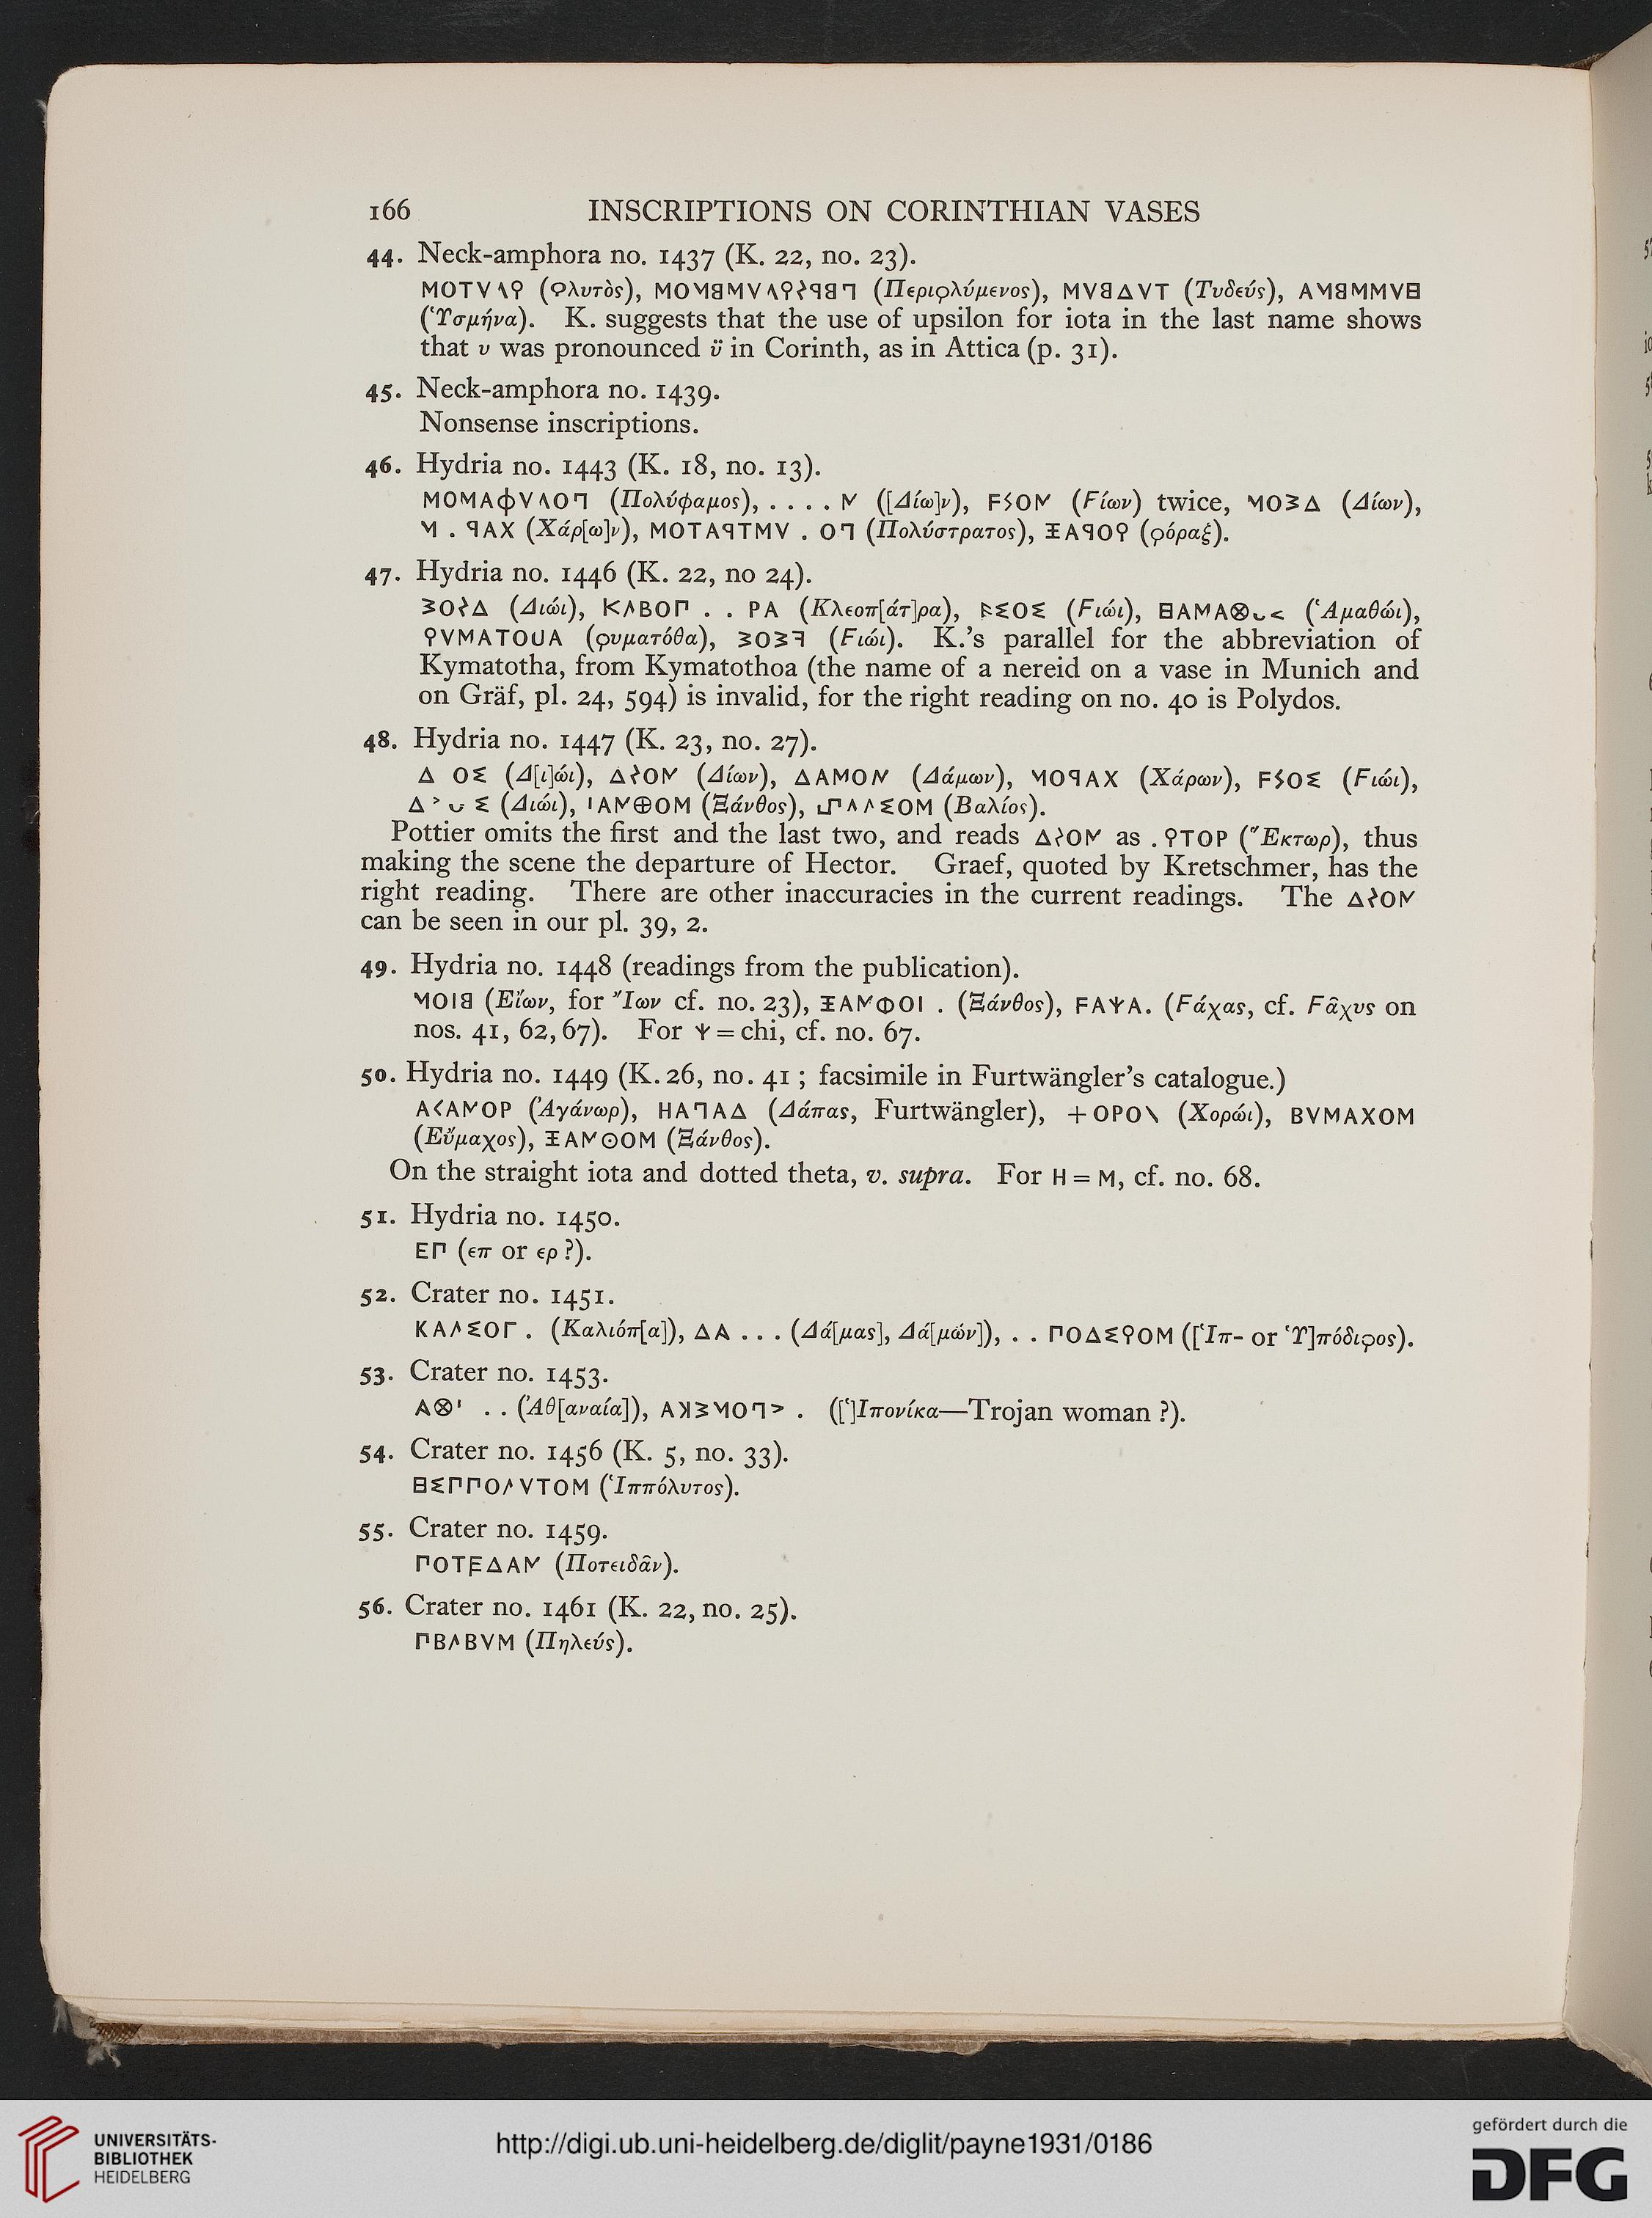 Payne, Humfry: Necrocorinthia: a study of Corinthian art in